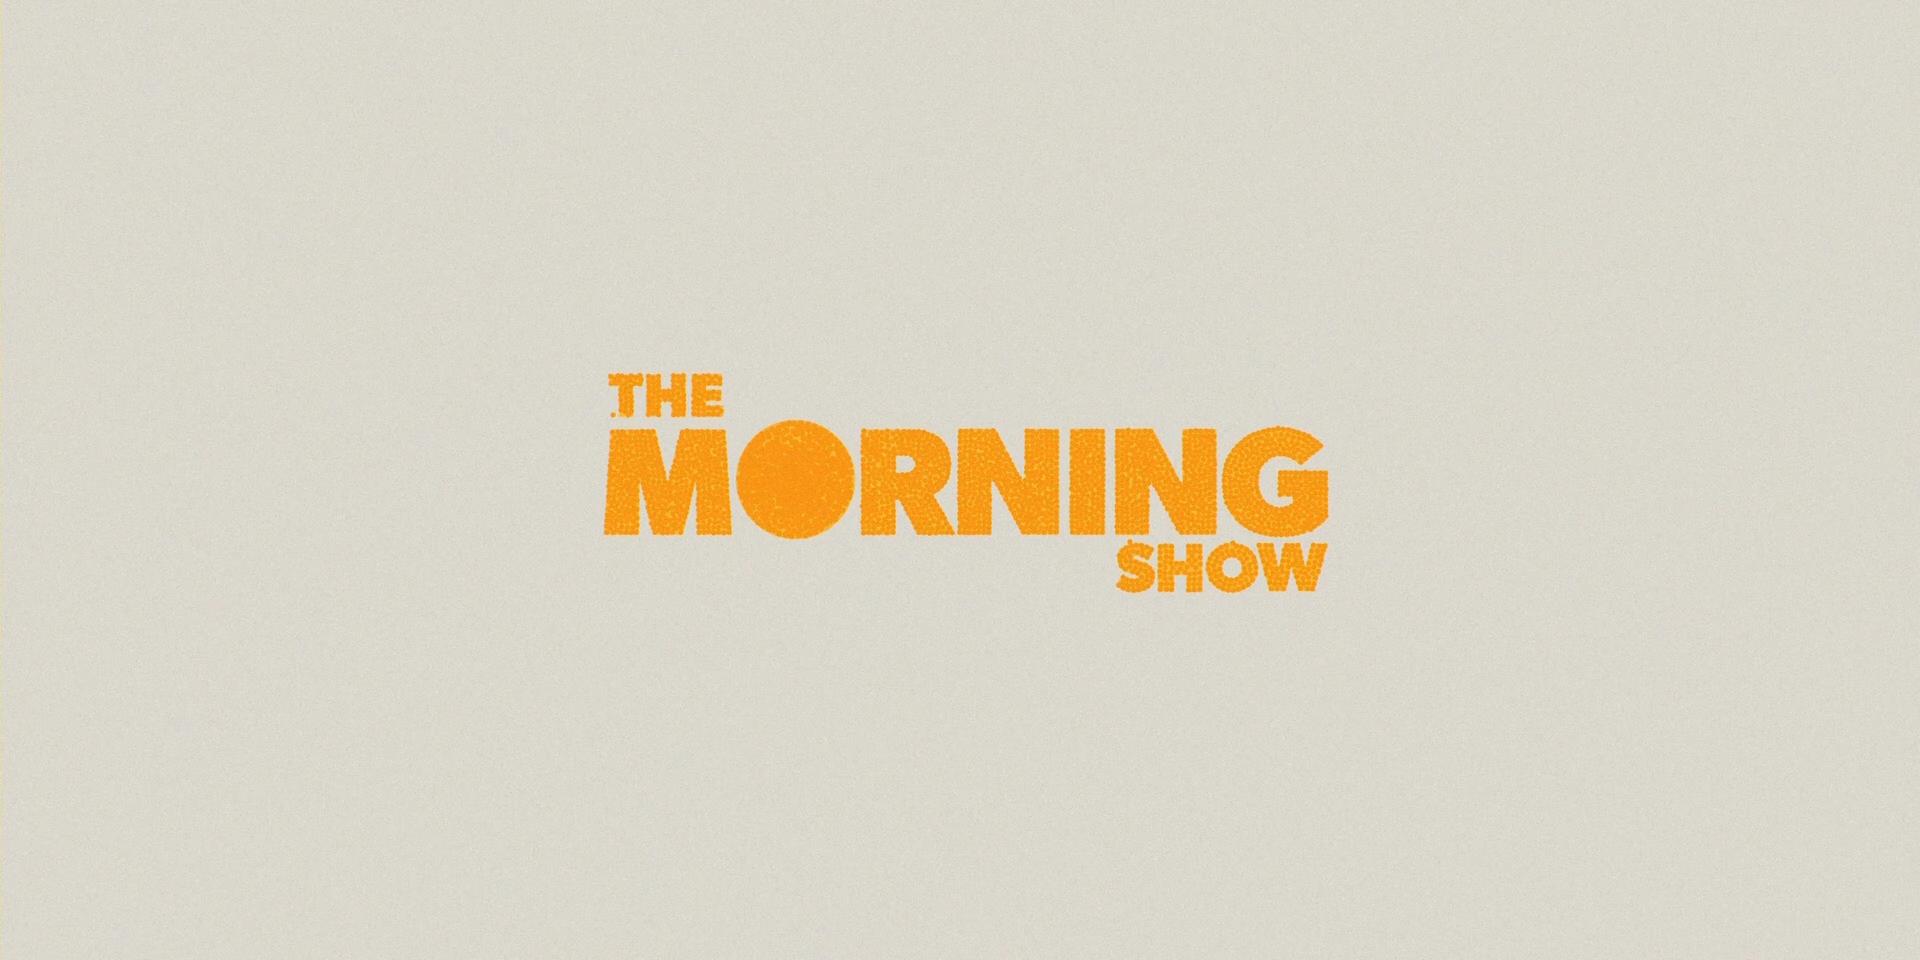 The Morning Show Temporada 2 (2021) 1080p WEB-DL Latino